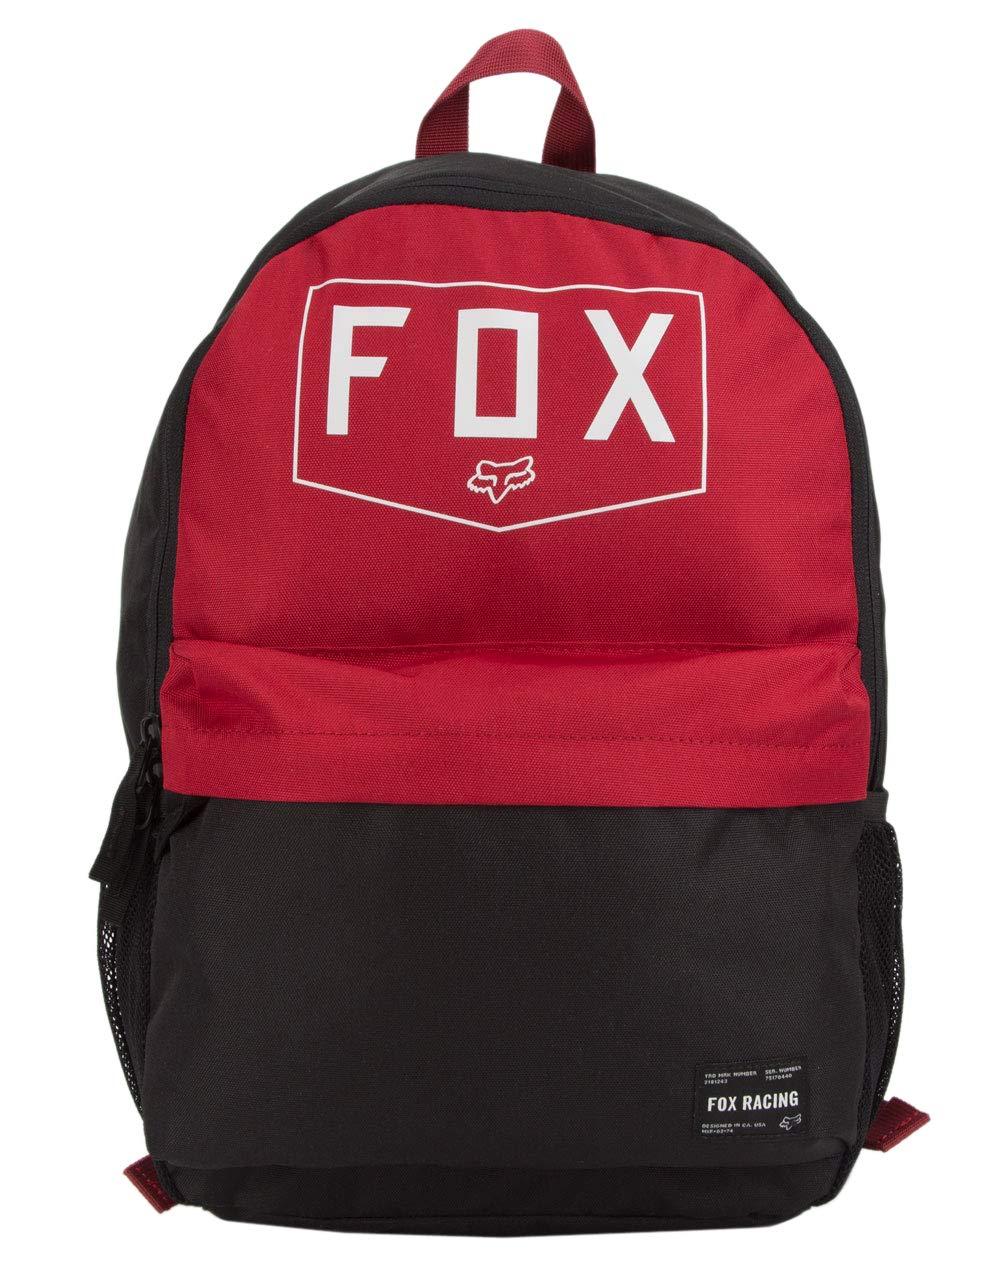 Fox Men's Legacy Backpack, Cardinal, OS